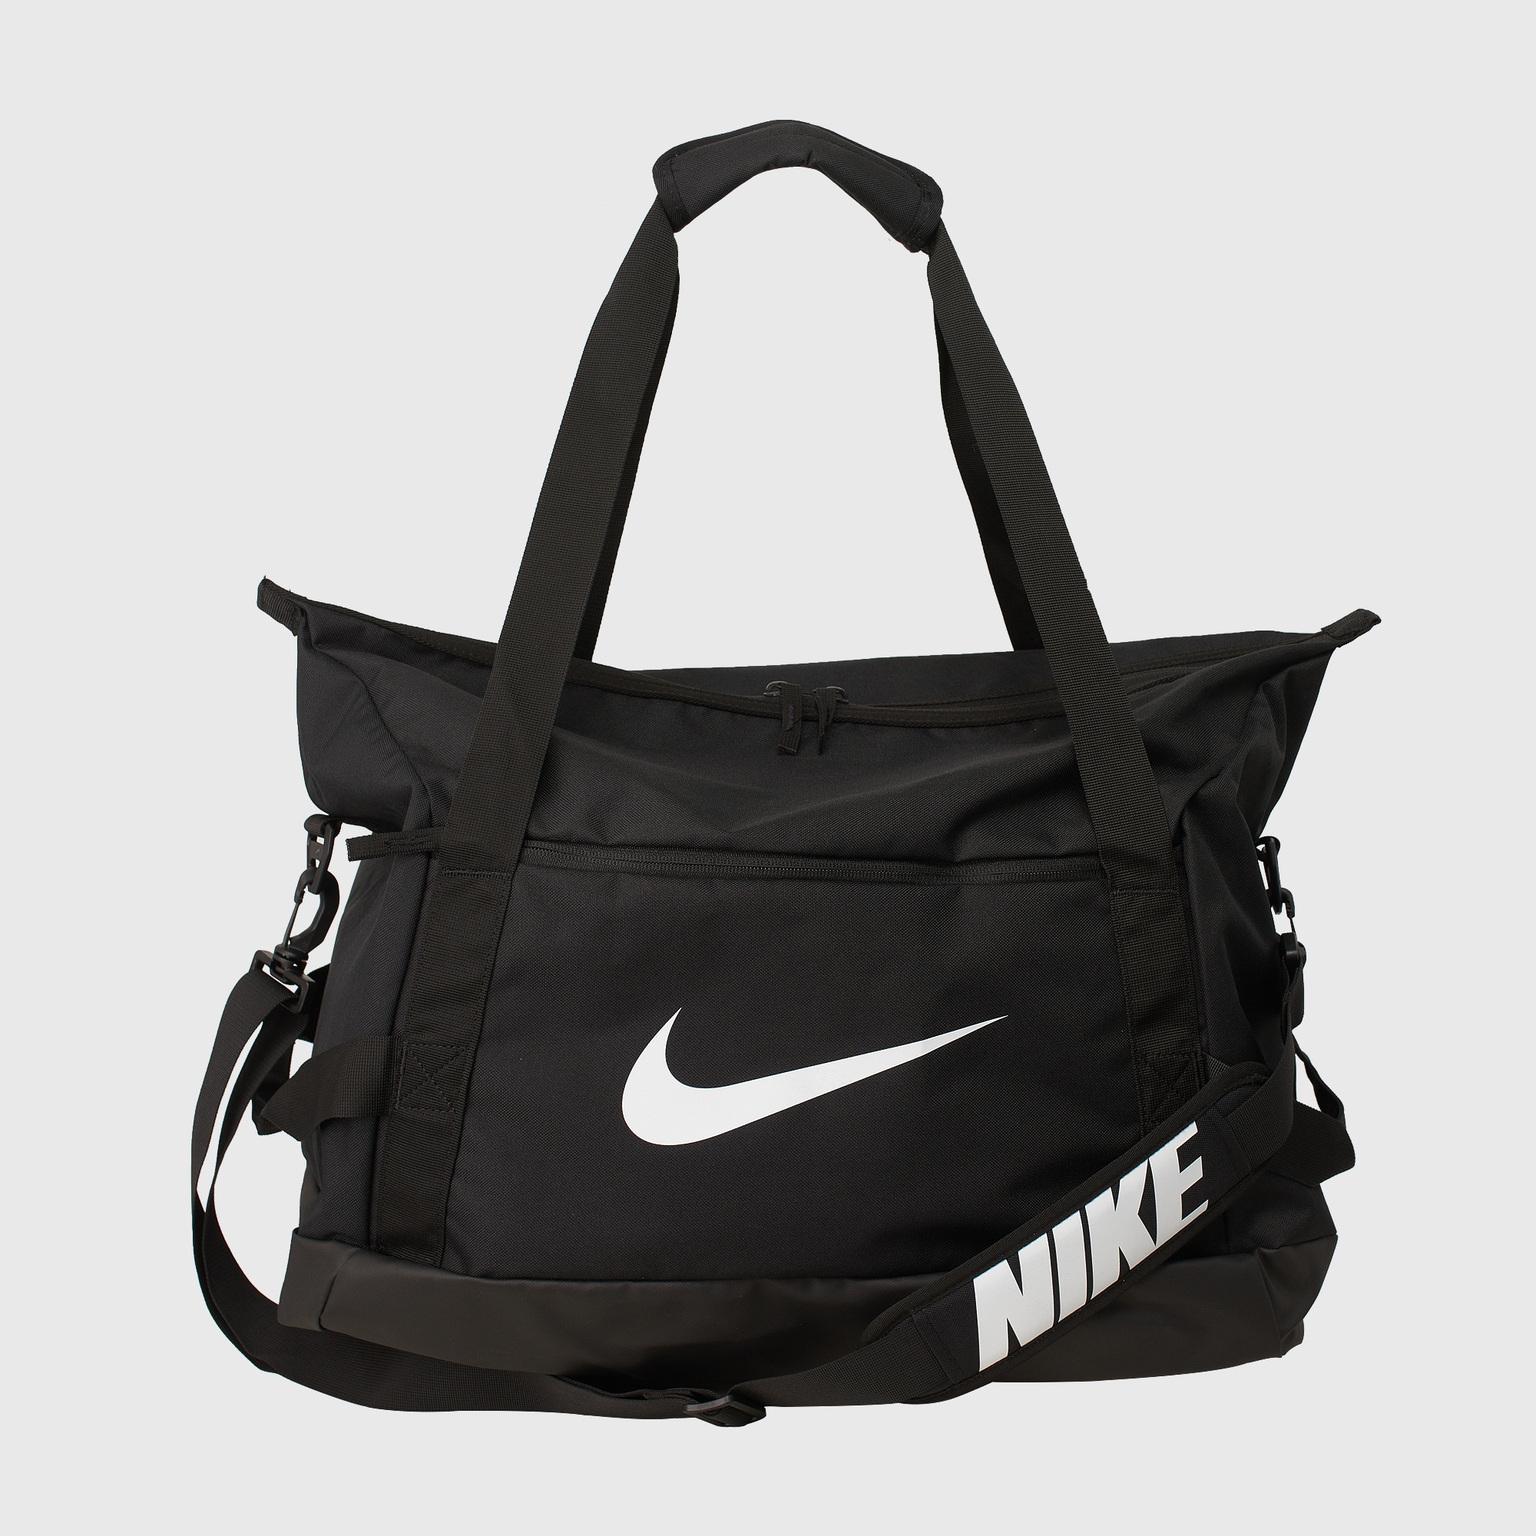 Сумка Nike Academy Team L CV7828-010 сумка на одно плечо nike team